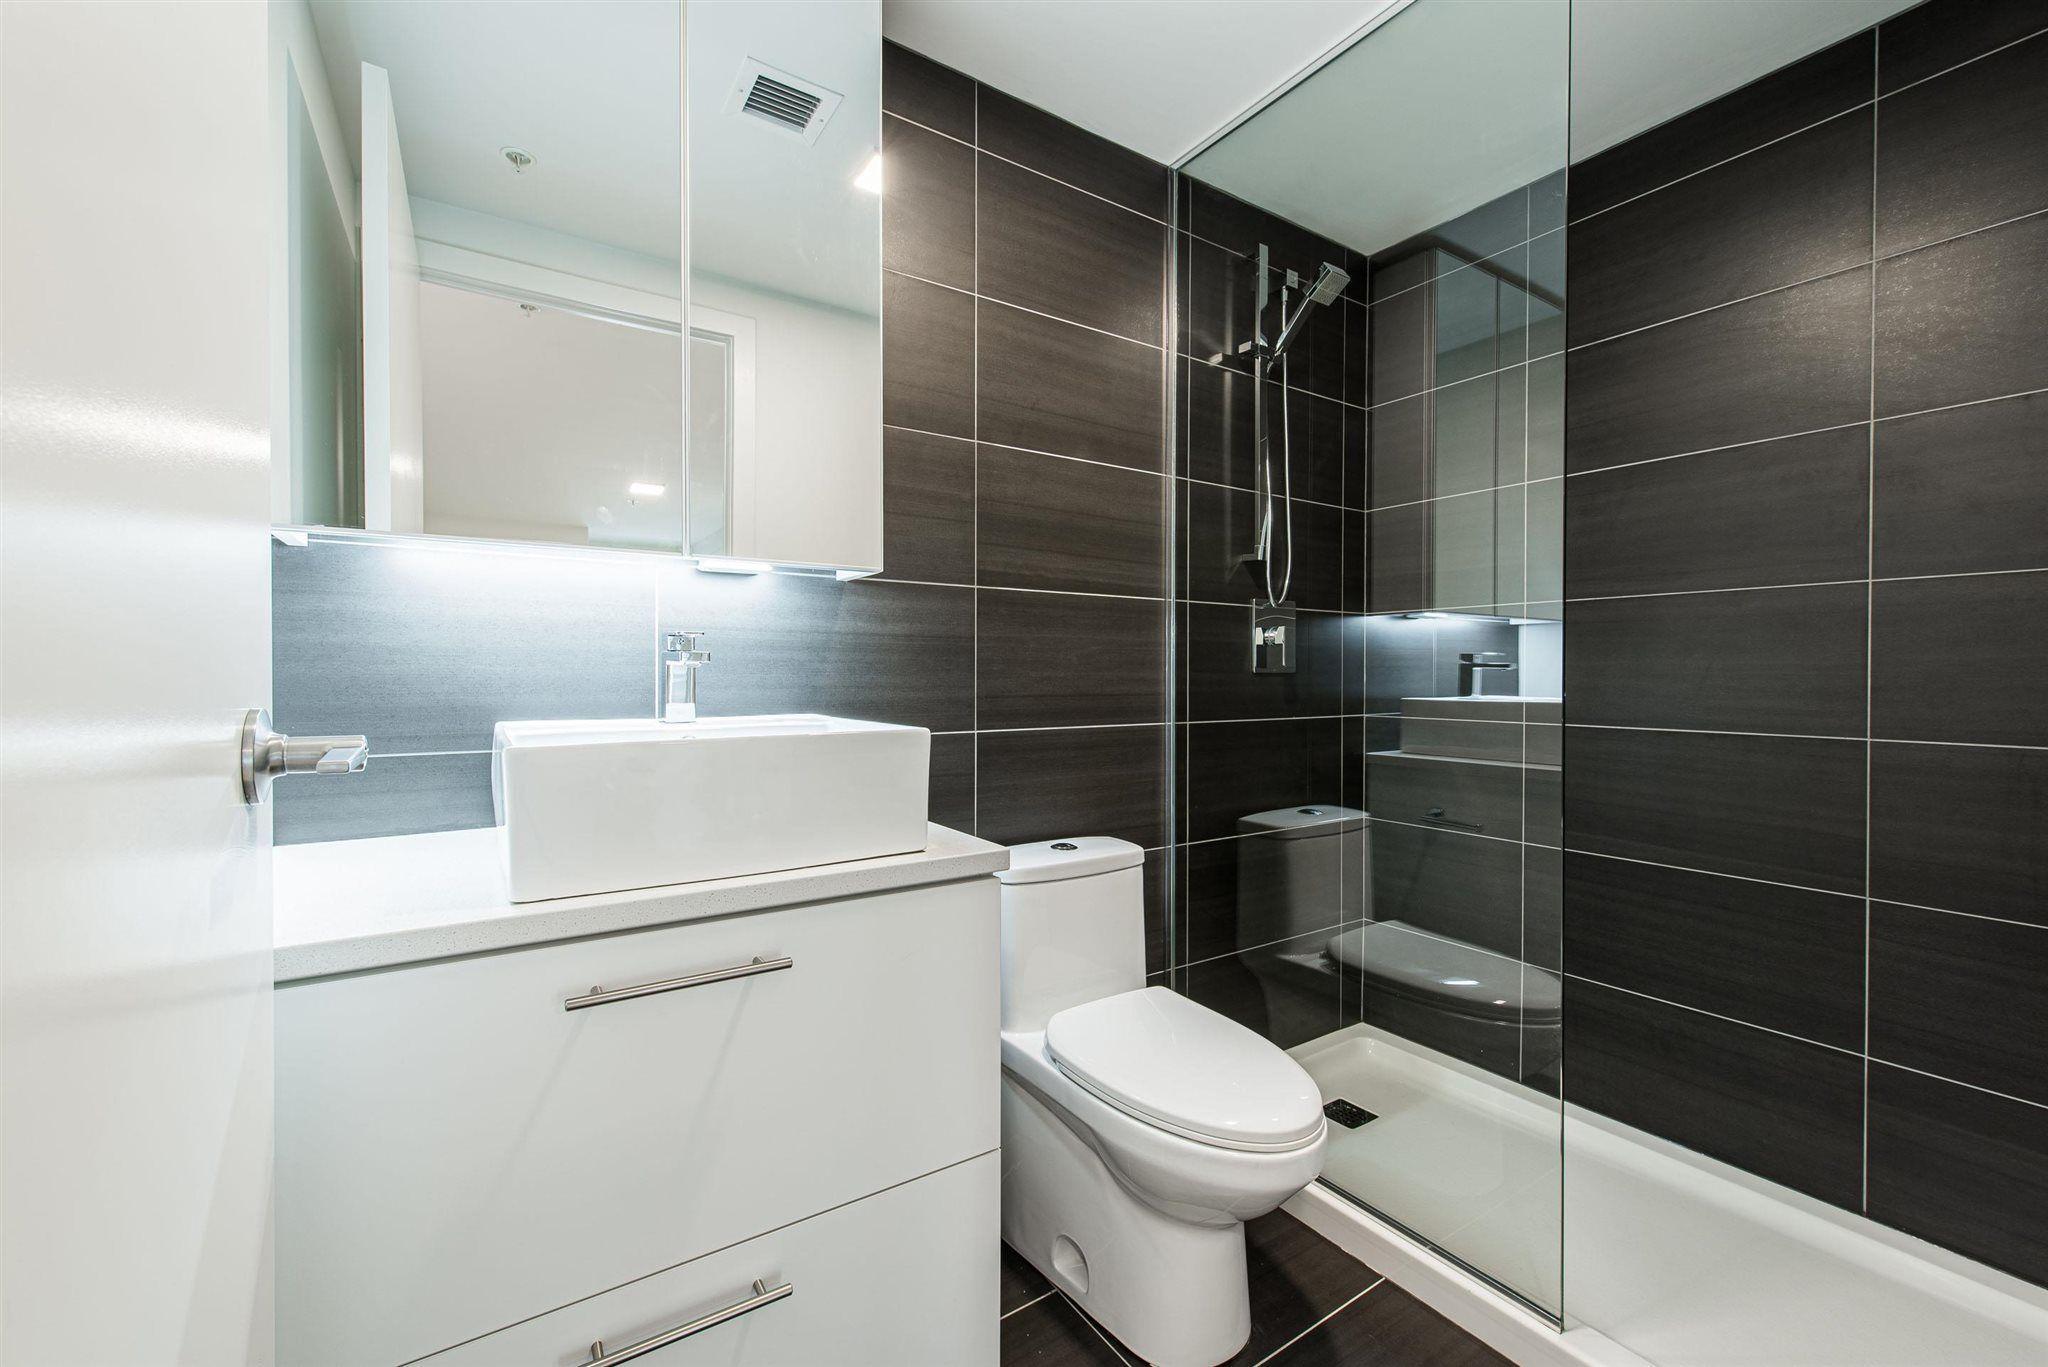 Photo 25: Photos: 105 1048 Wellington Street in Halifax: 2-Halifax South Residential for sale (Halifax-Dartmouth)  : MLS®# 202100816